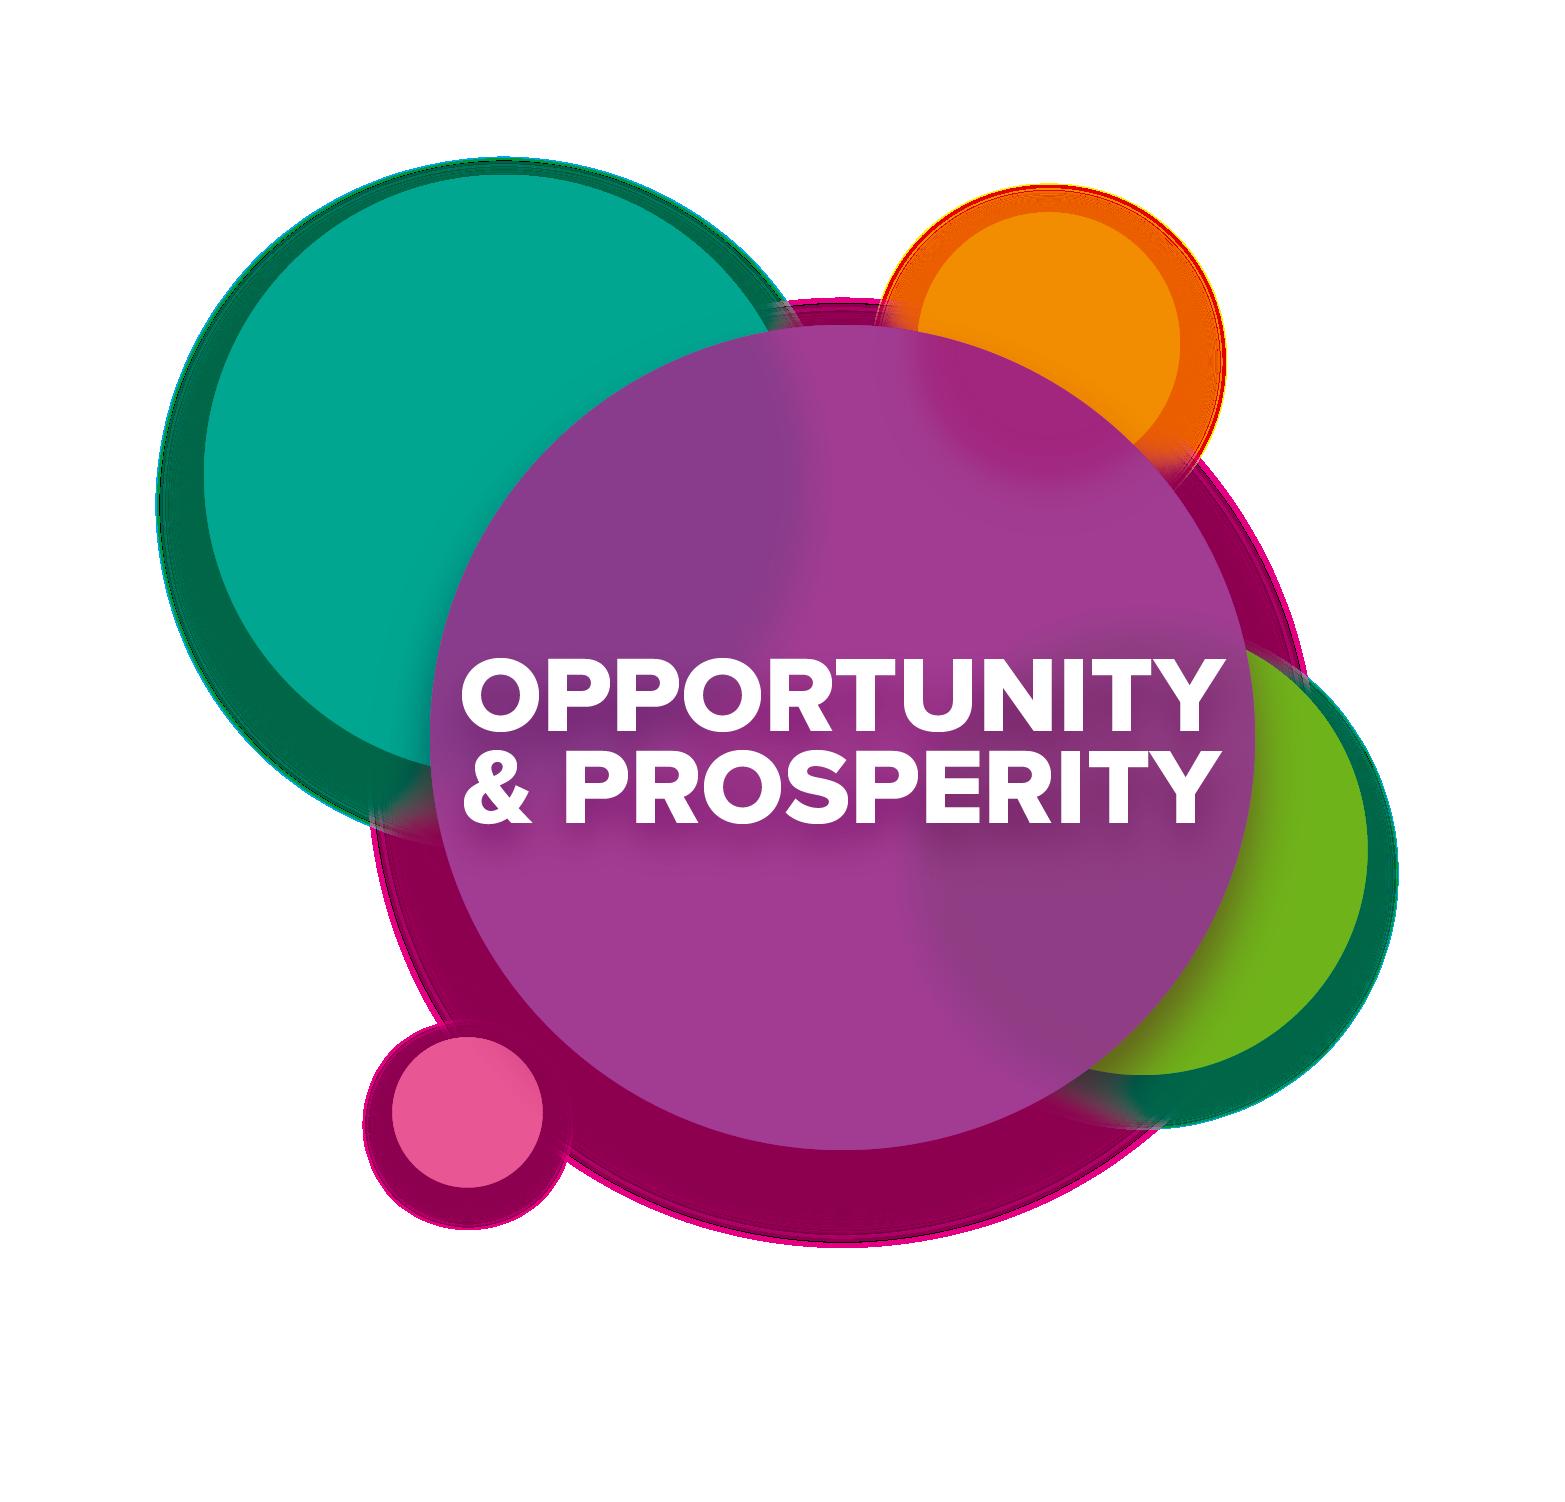 2050 Opportunity and Prosperity logo